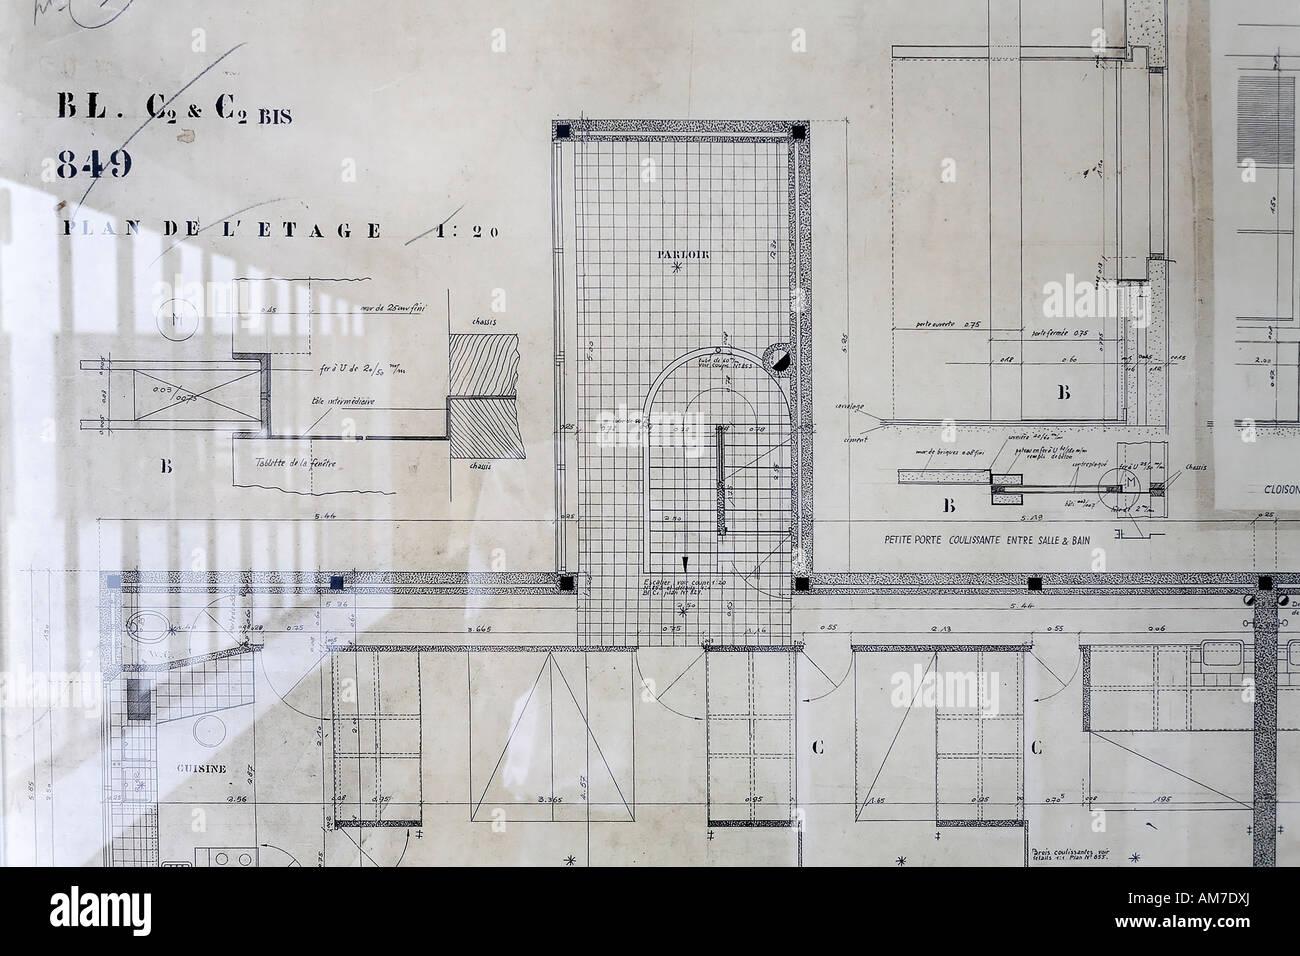 Le Corbusier House From 1927, Original Architectu0027s Plan Of The Upper Floor,  Weissenhof Museum